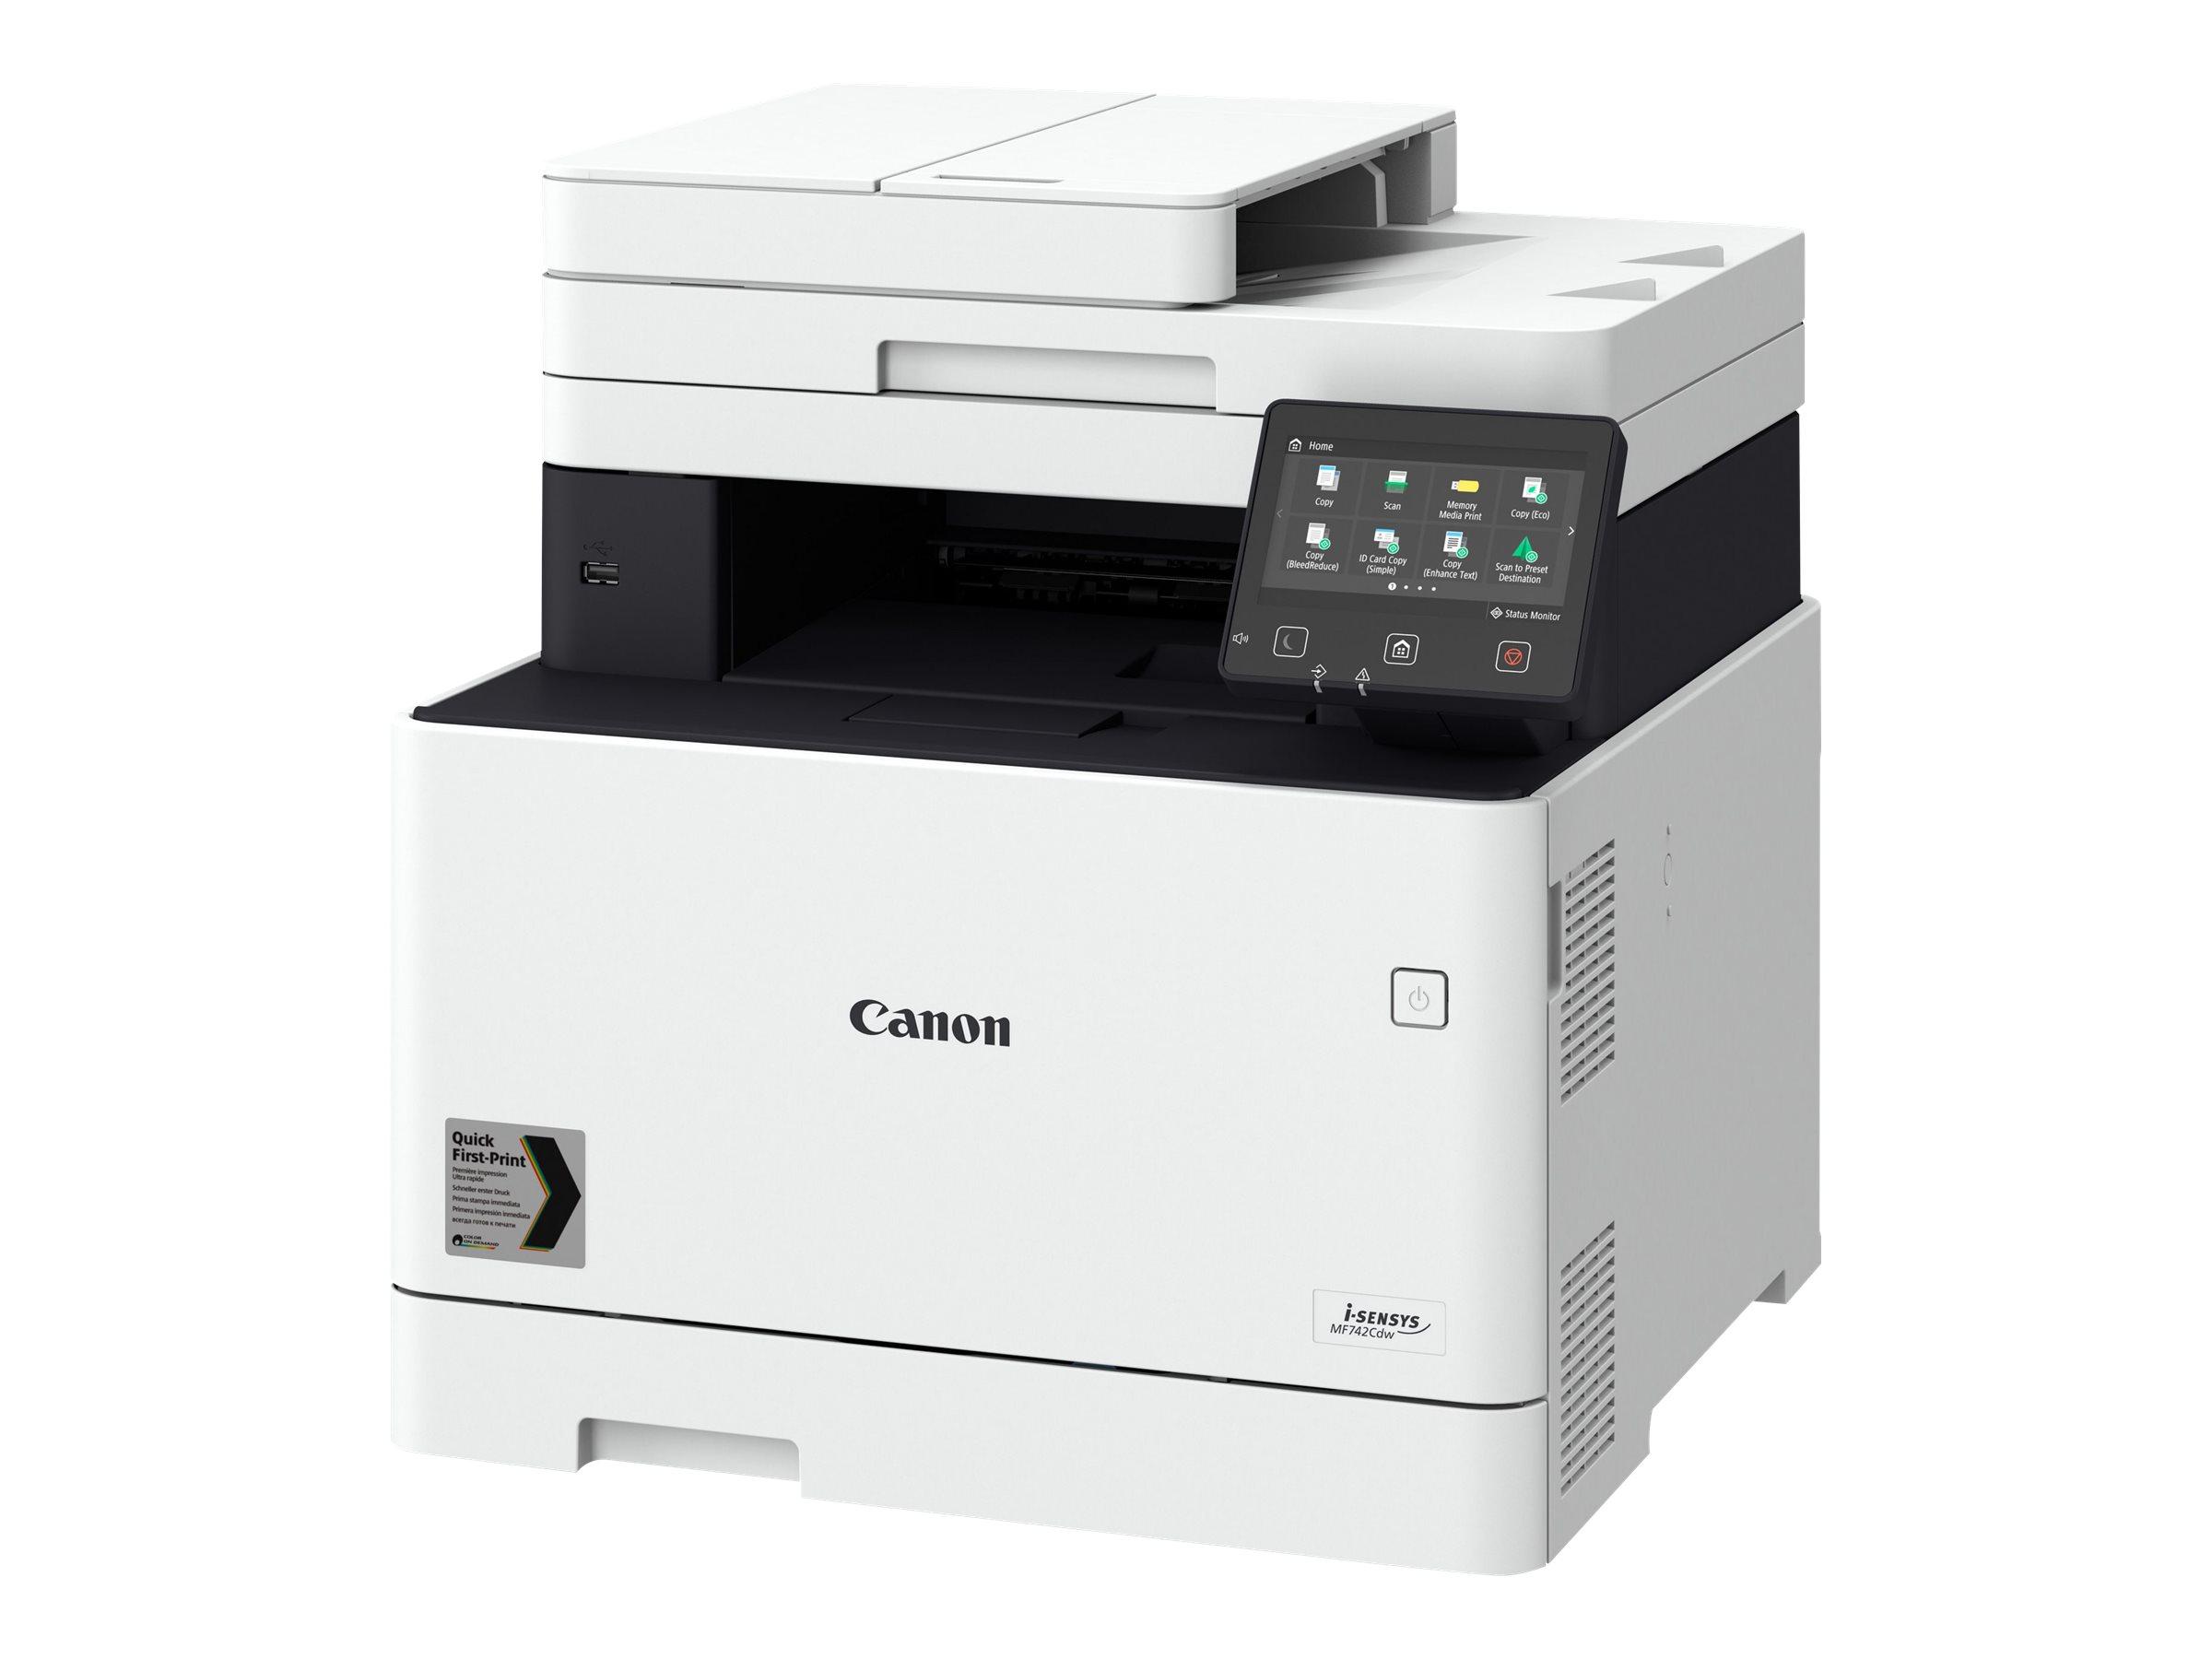 Canon i-SENSYS MF742Cdw - imprimante laser multifonction couleur A4 - recto-verso - Wifi